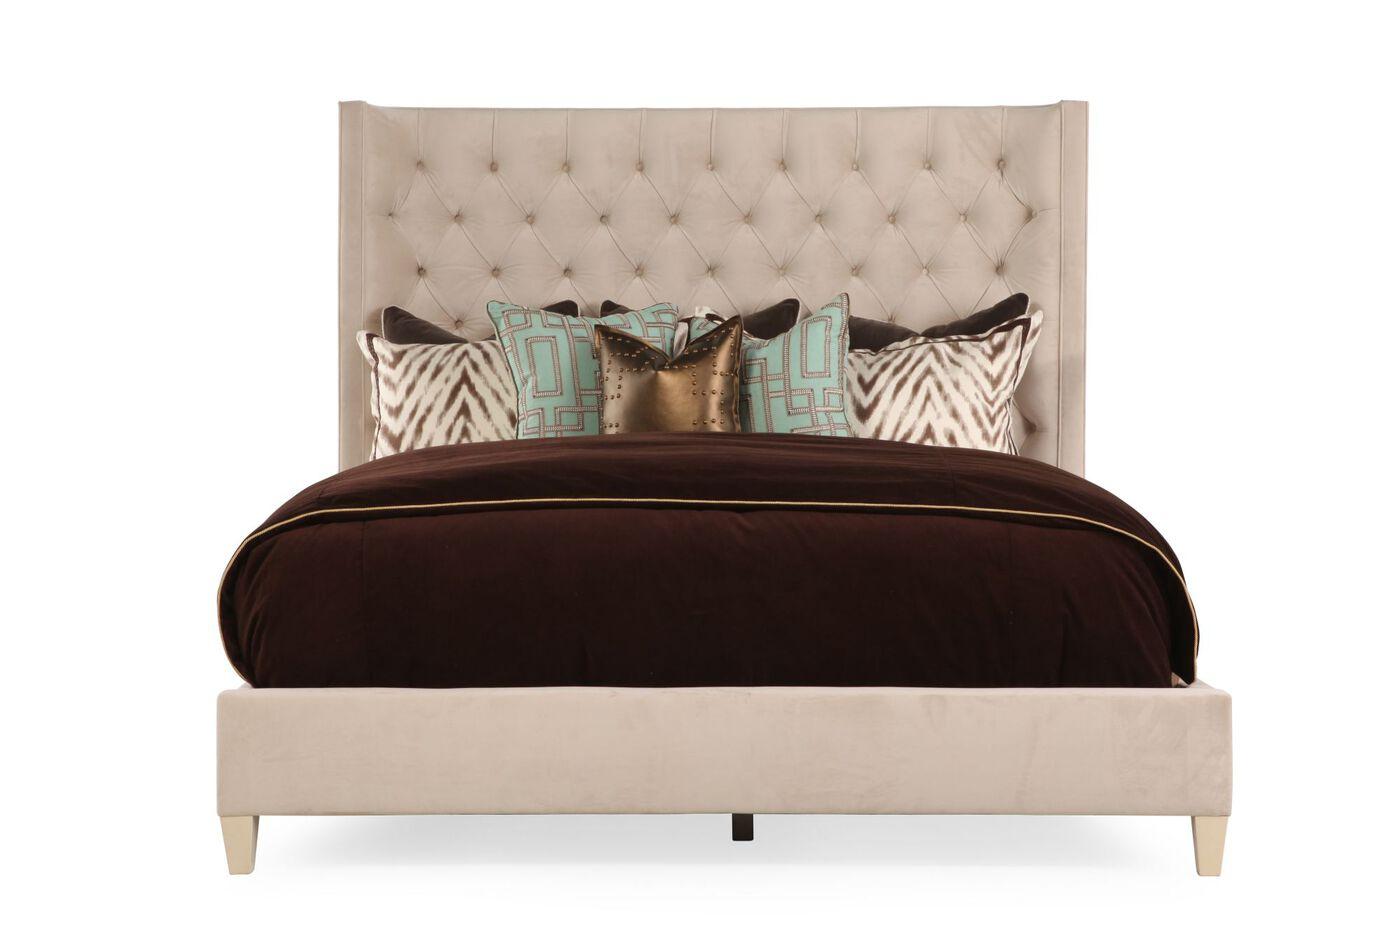 Bernhardt Salon Upholstered Bed | Mathis Brothers Furniture